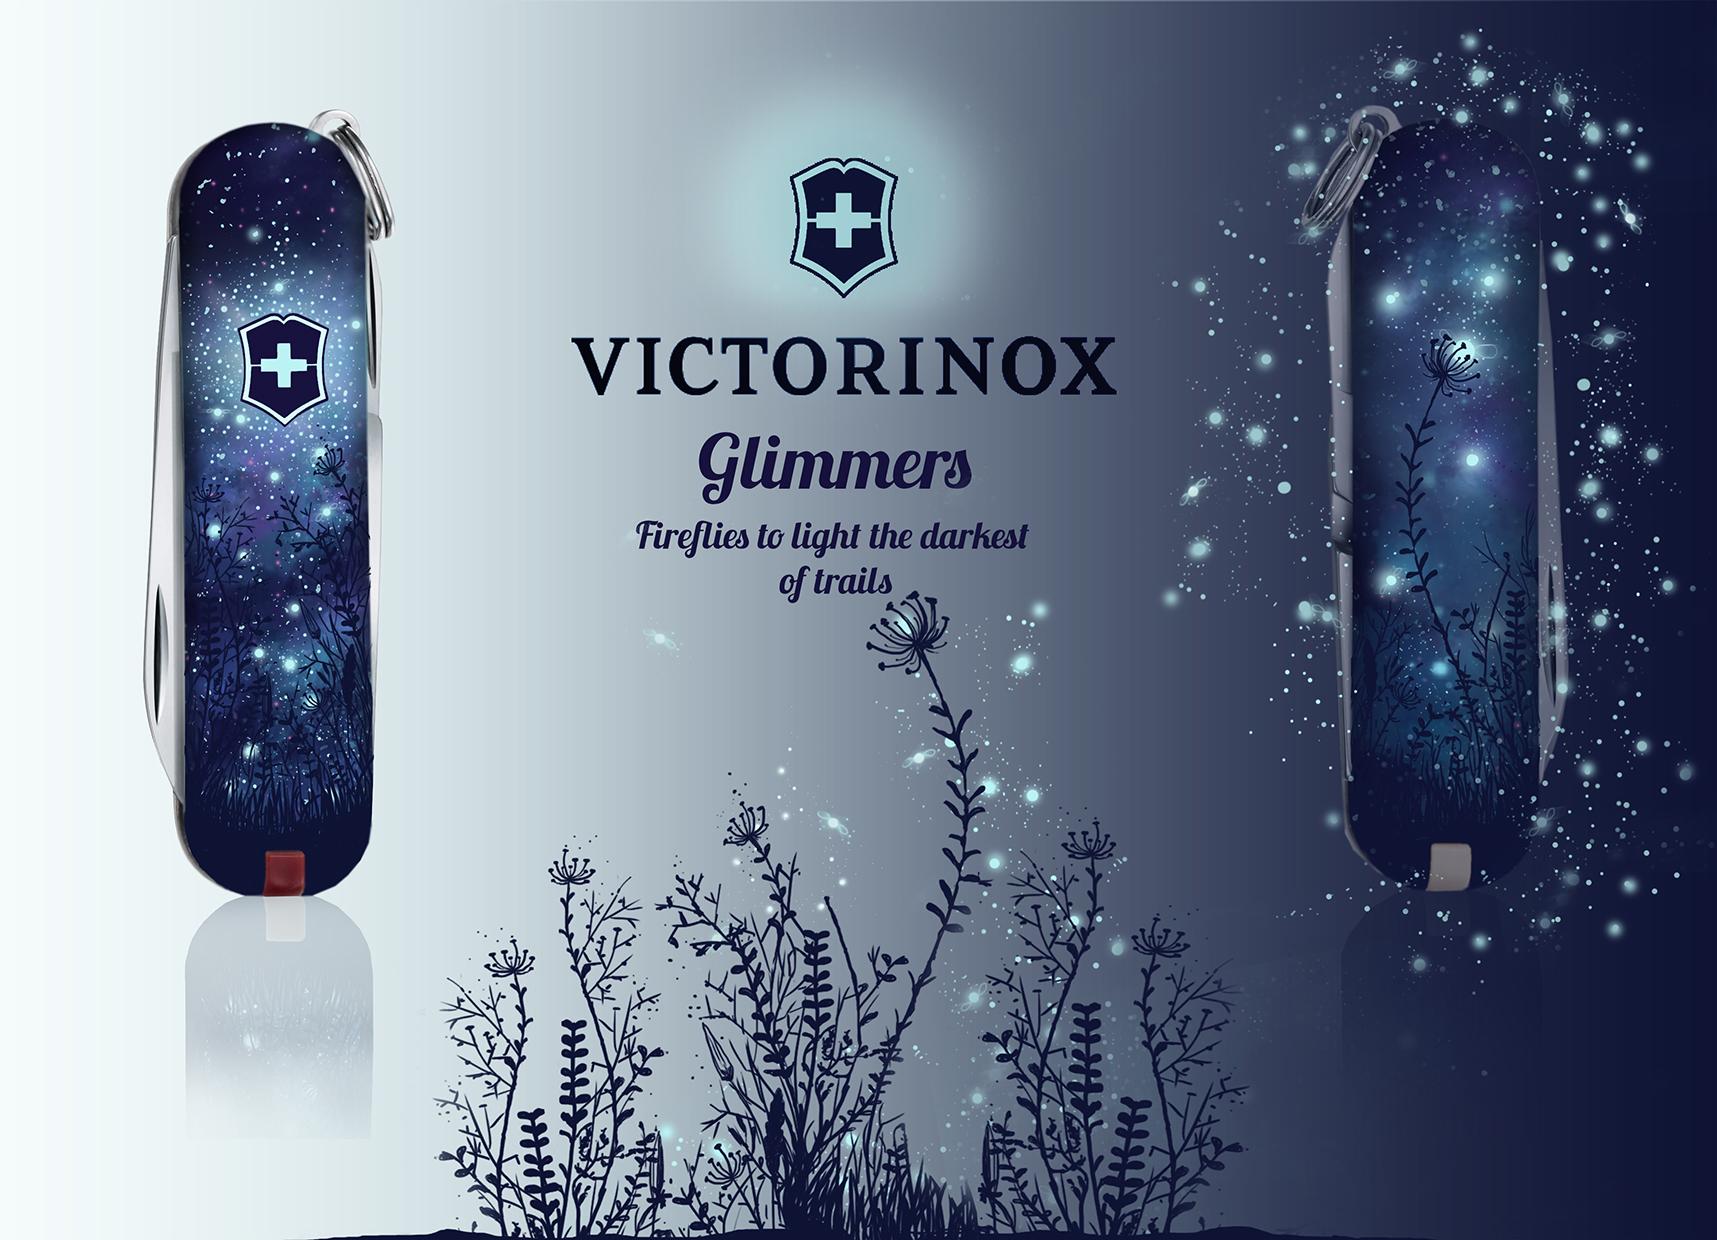 1 Victorinox Glimmers _panel1_small.jpg